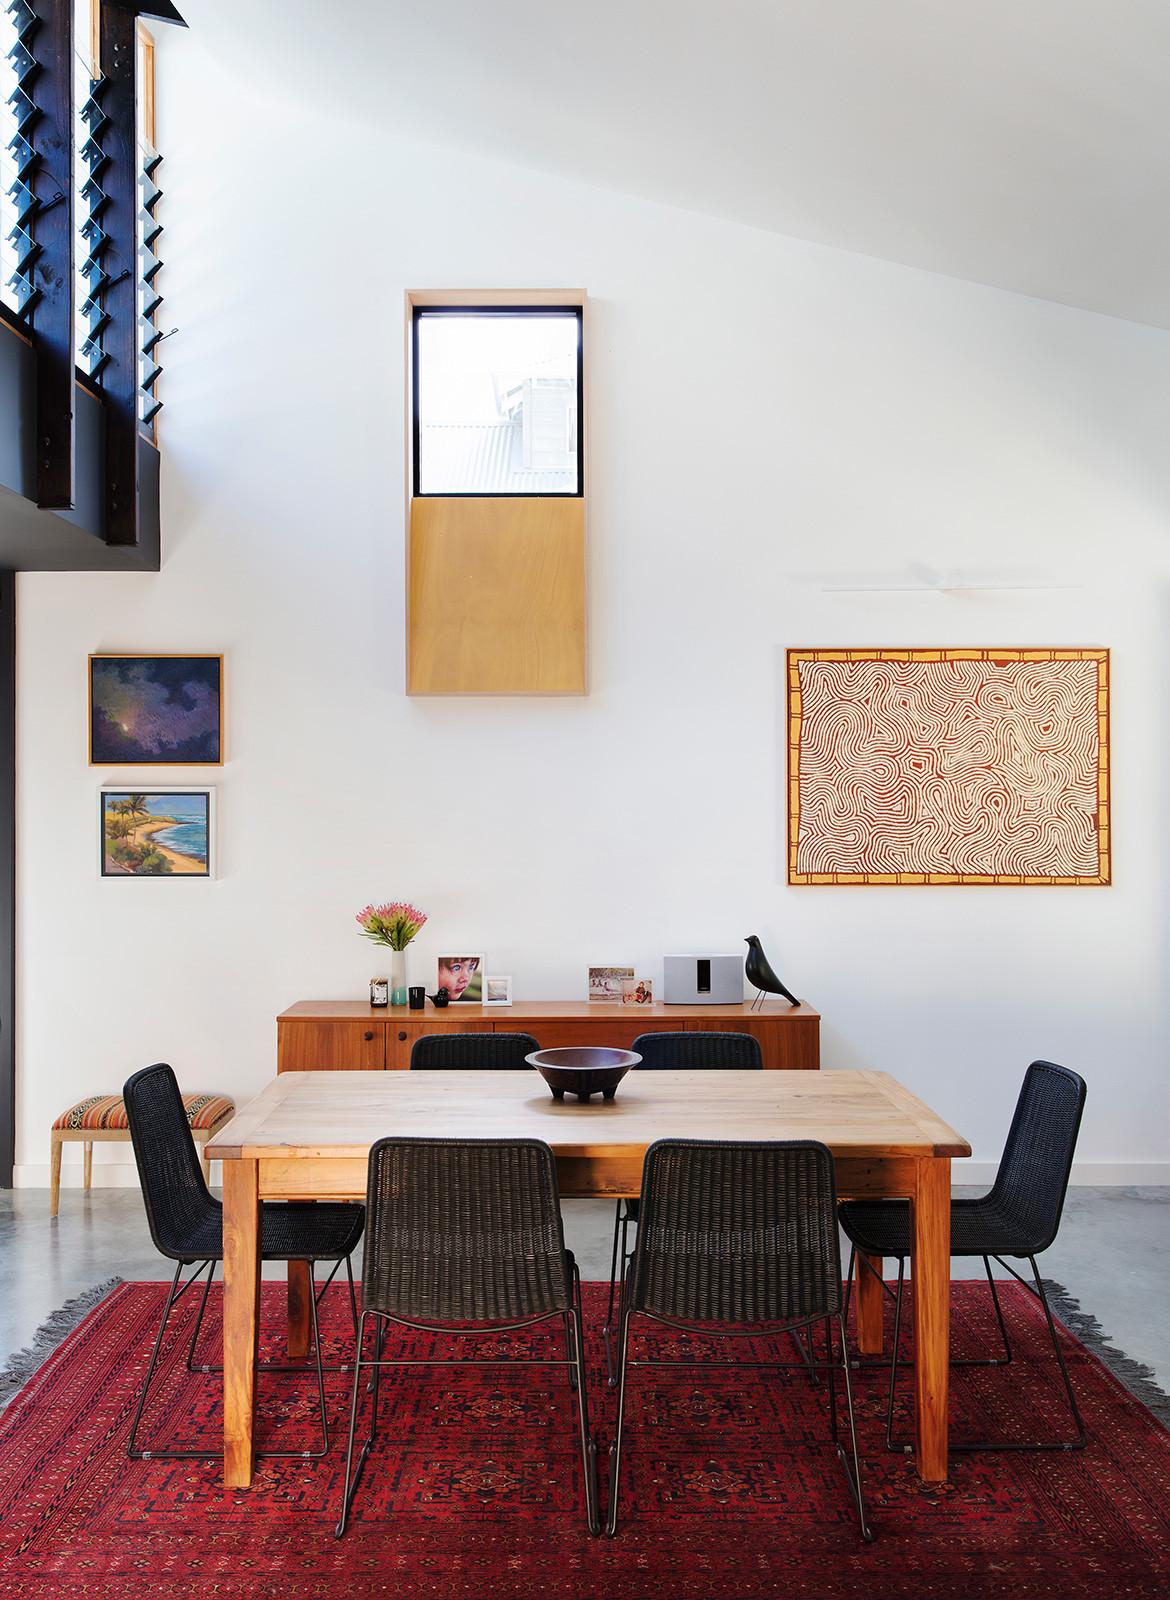 Forrest Street Philip Stejskal Architecture CC Bo Wong dining